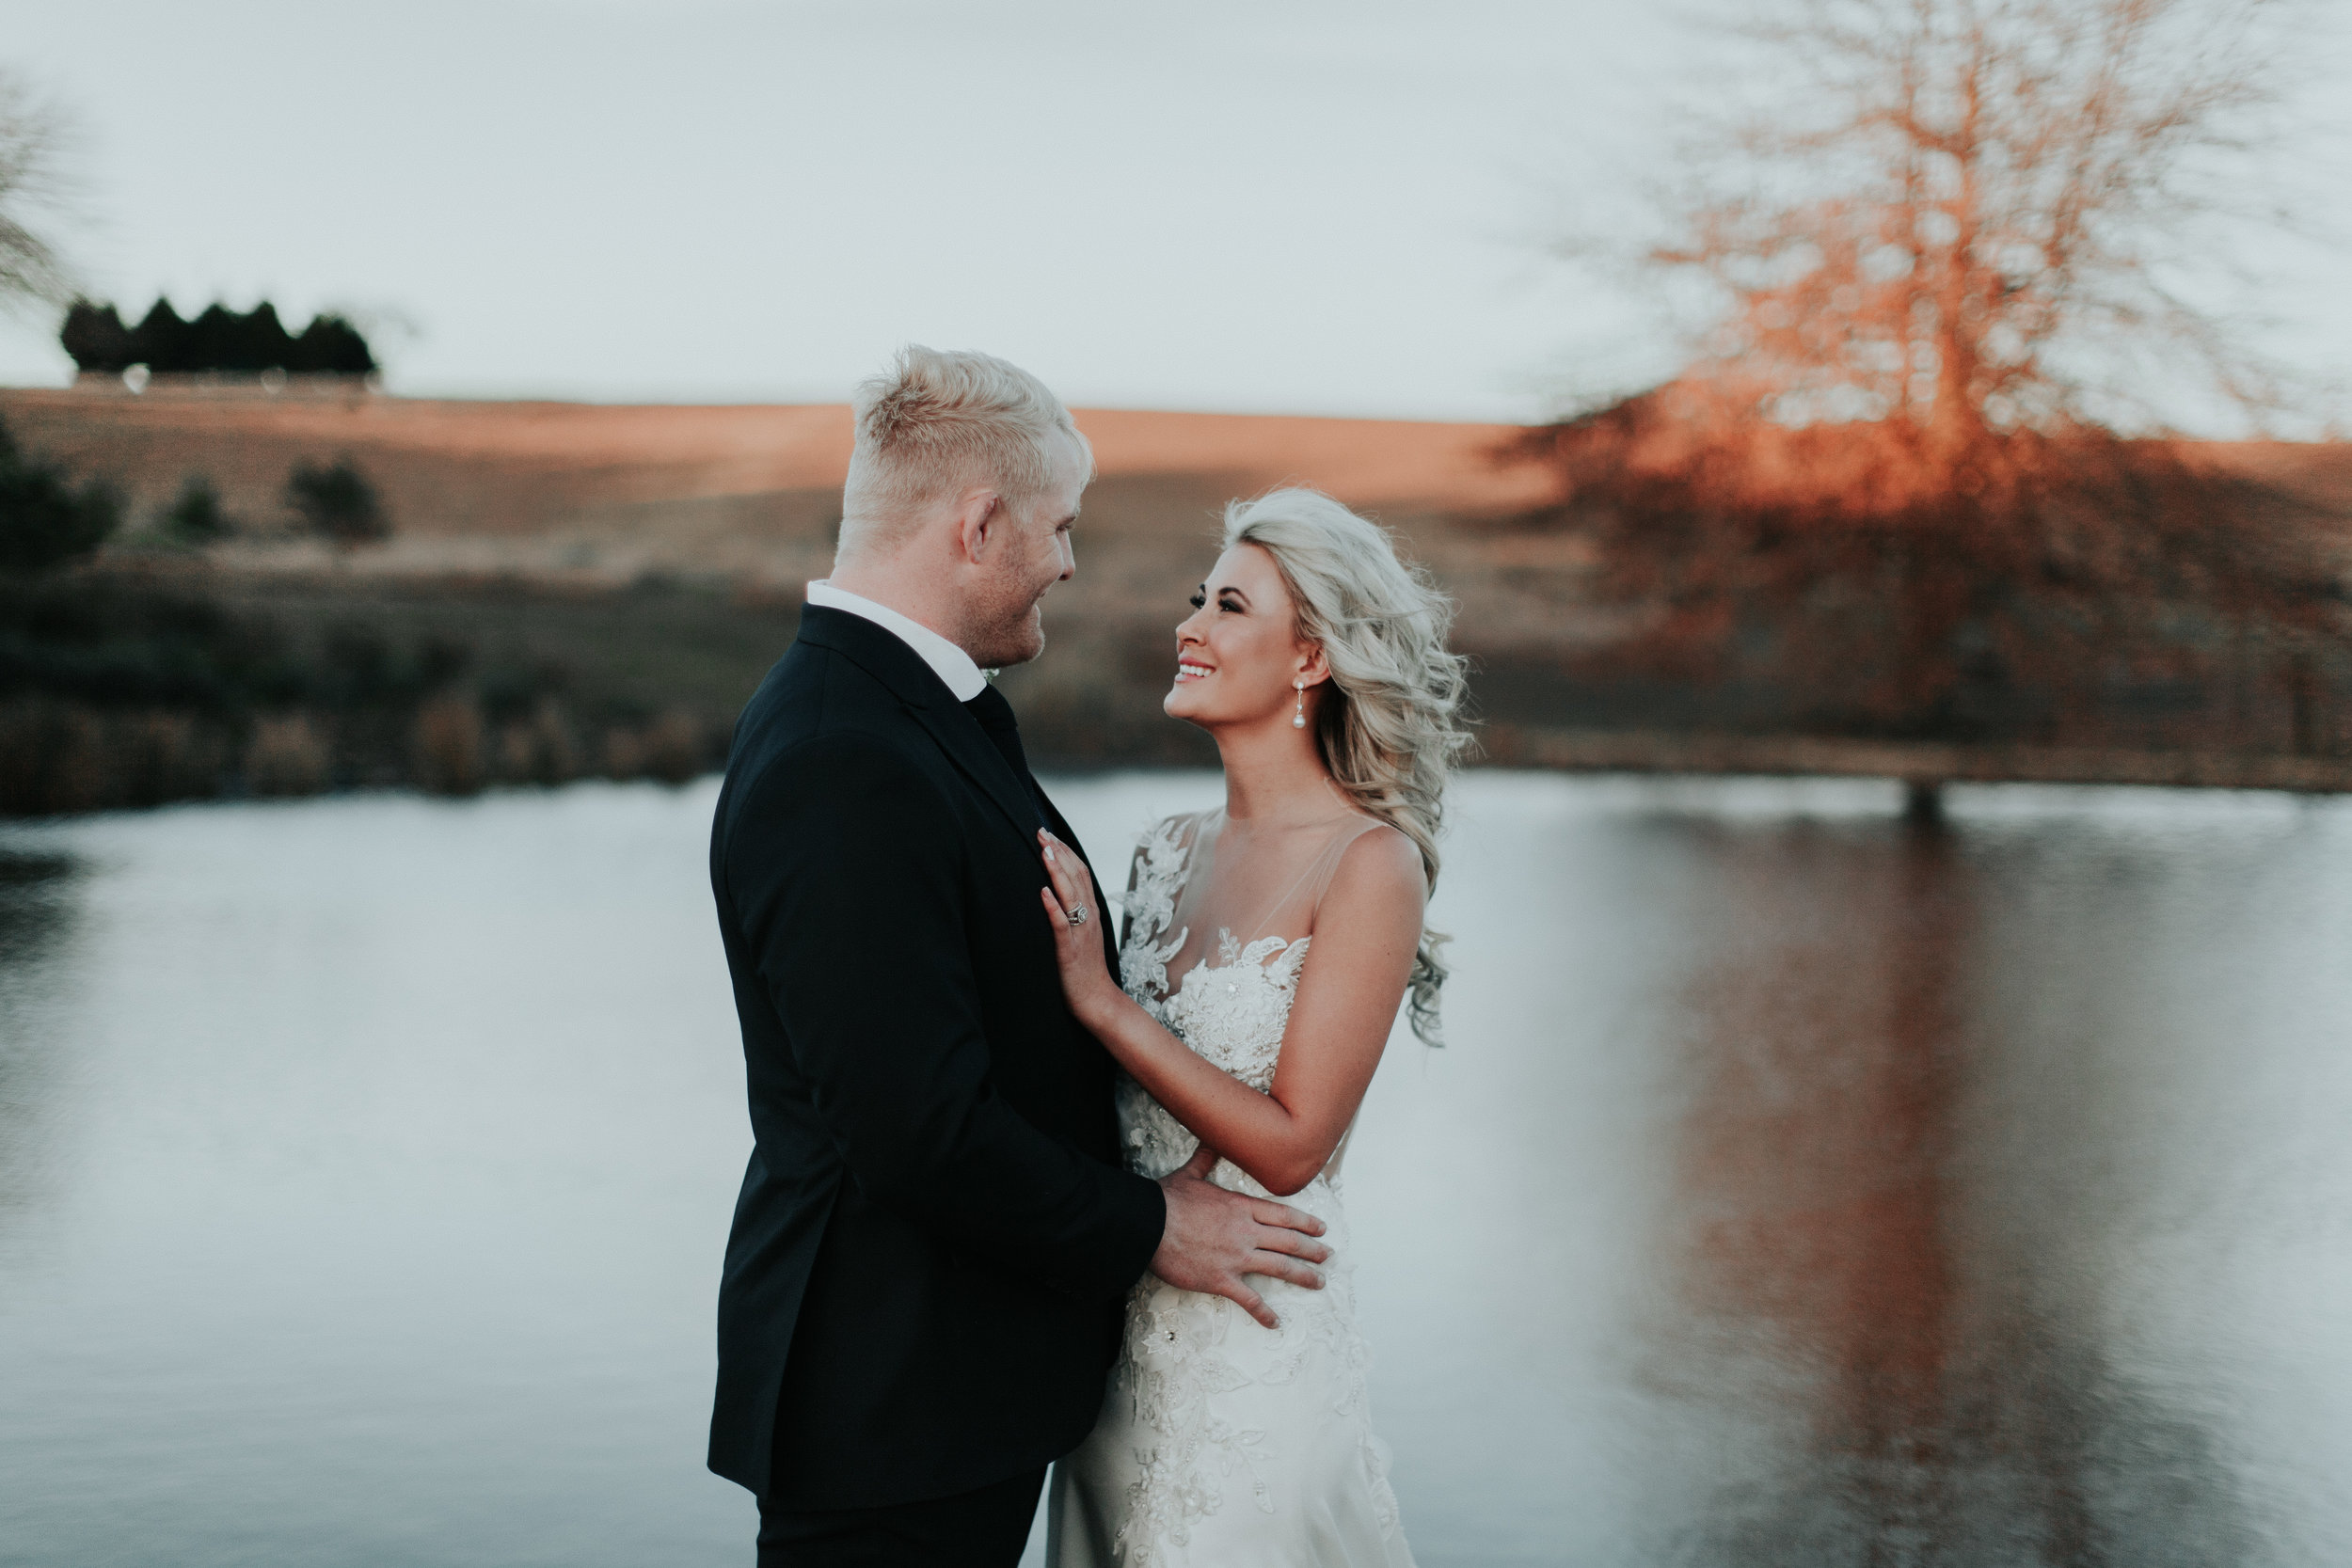 Kristi Smith Photography_Vincent&Jandre_ Wedding Photographer 27.jpg